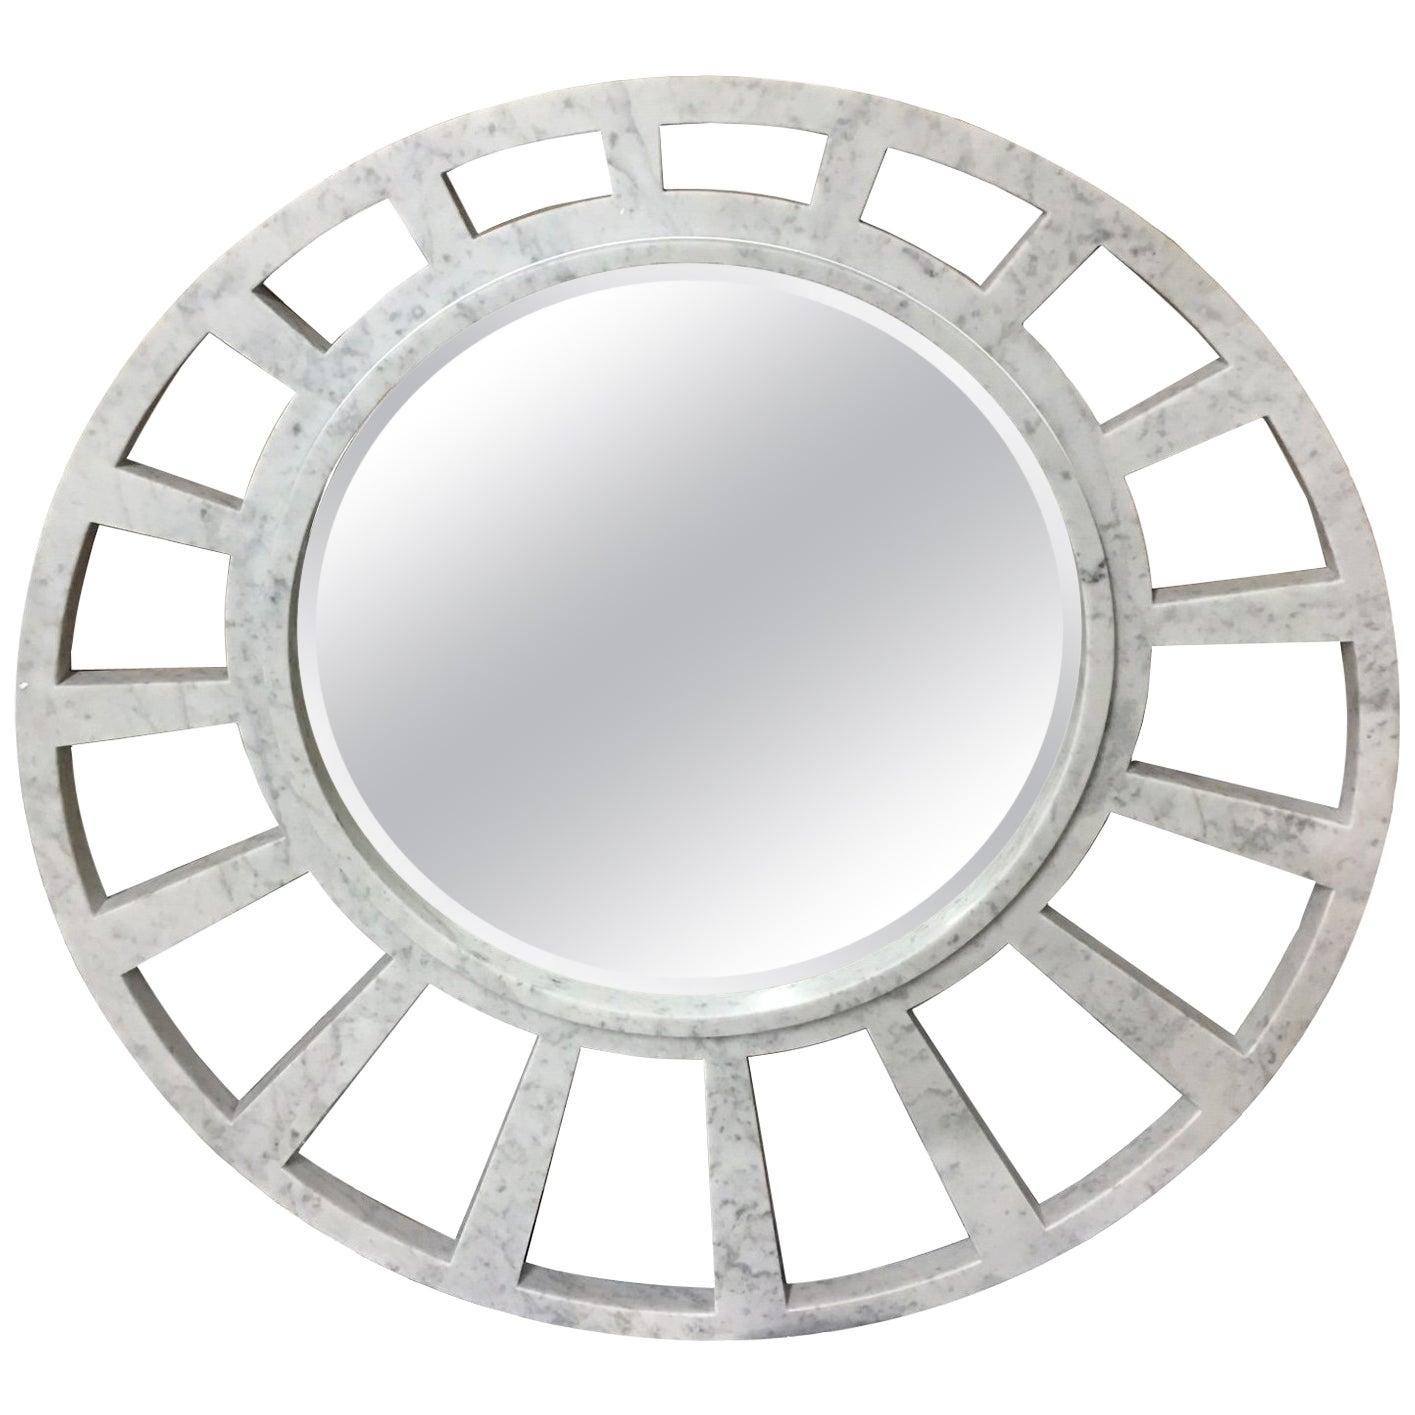 Italian White Carrara Marble Mirror, Modern Round Sunburst by Massimo Mangiardi